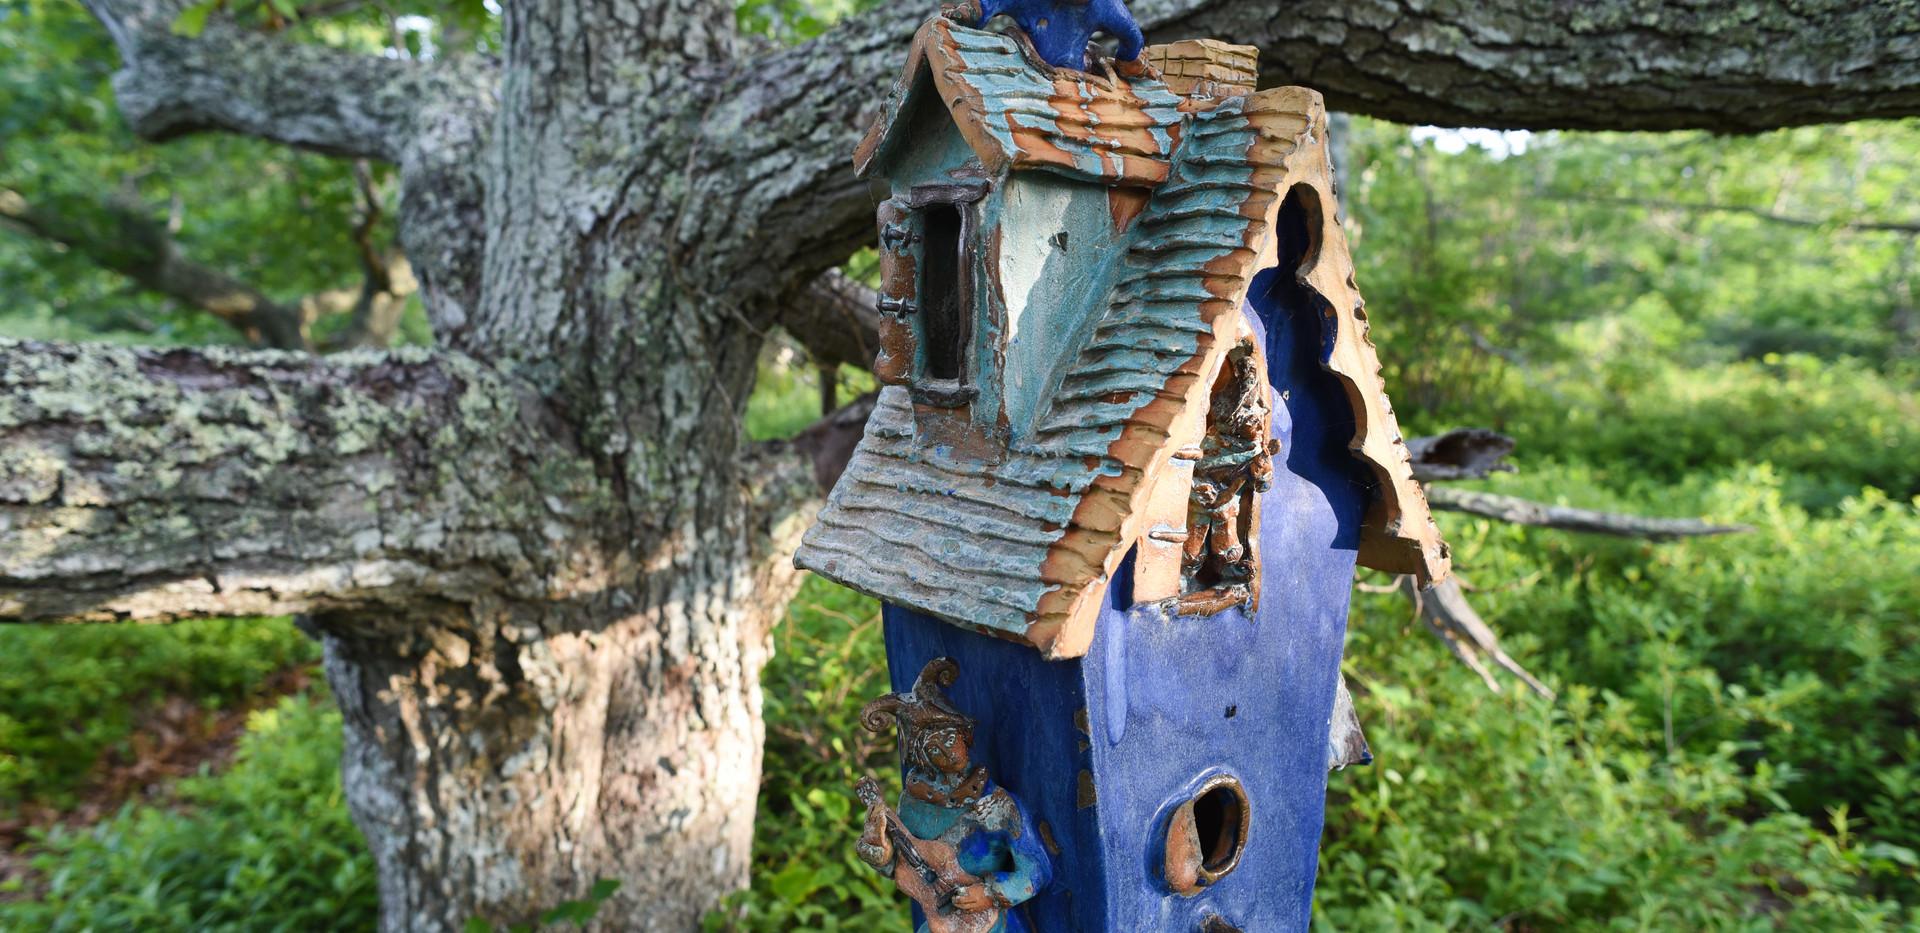 Musical Birdhouse